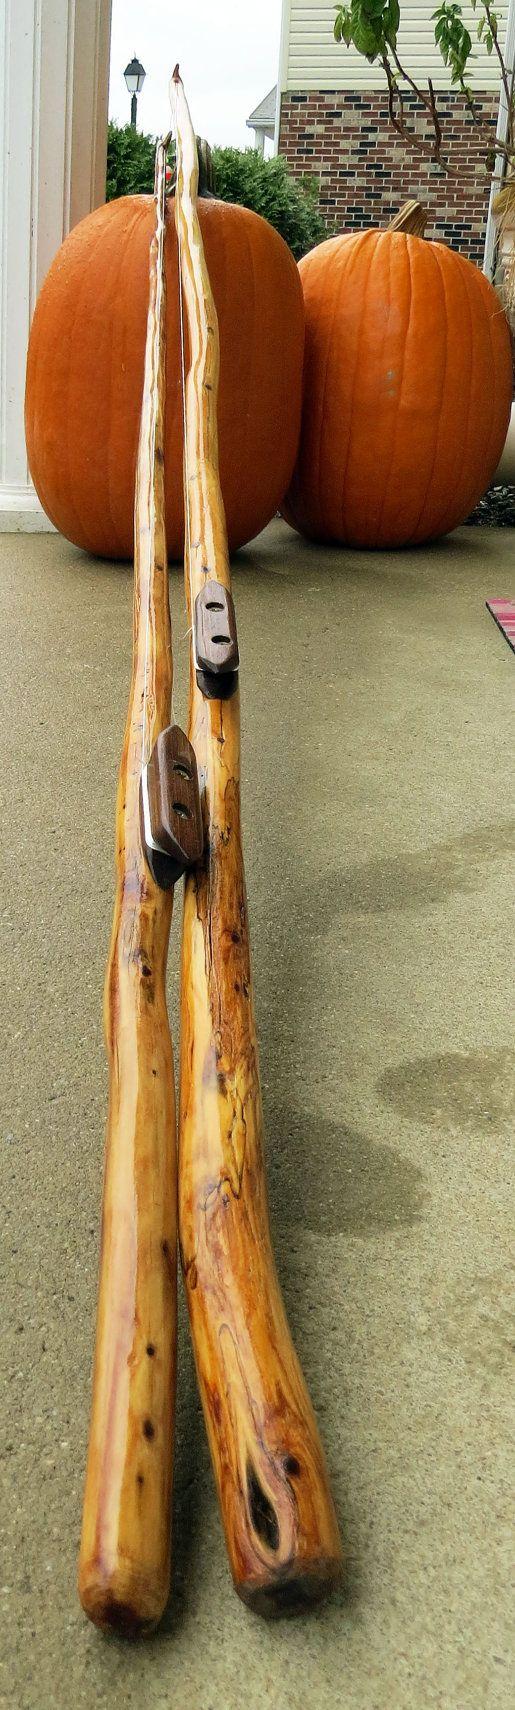 Handmade RUSTIC wooden fishing pole